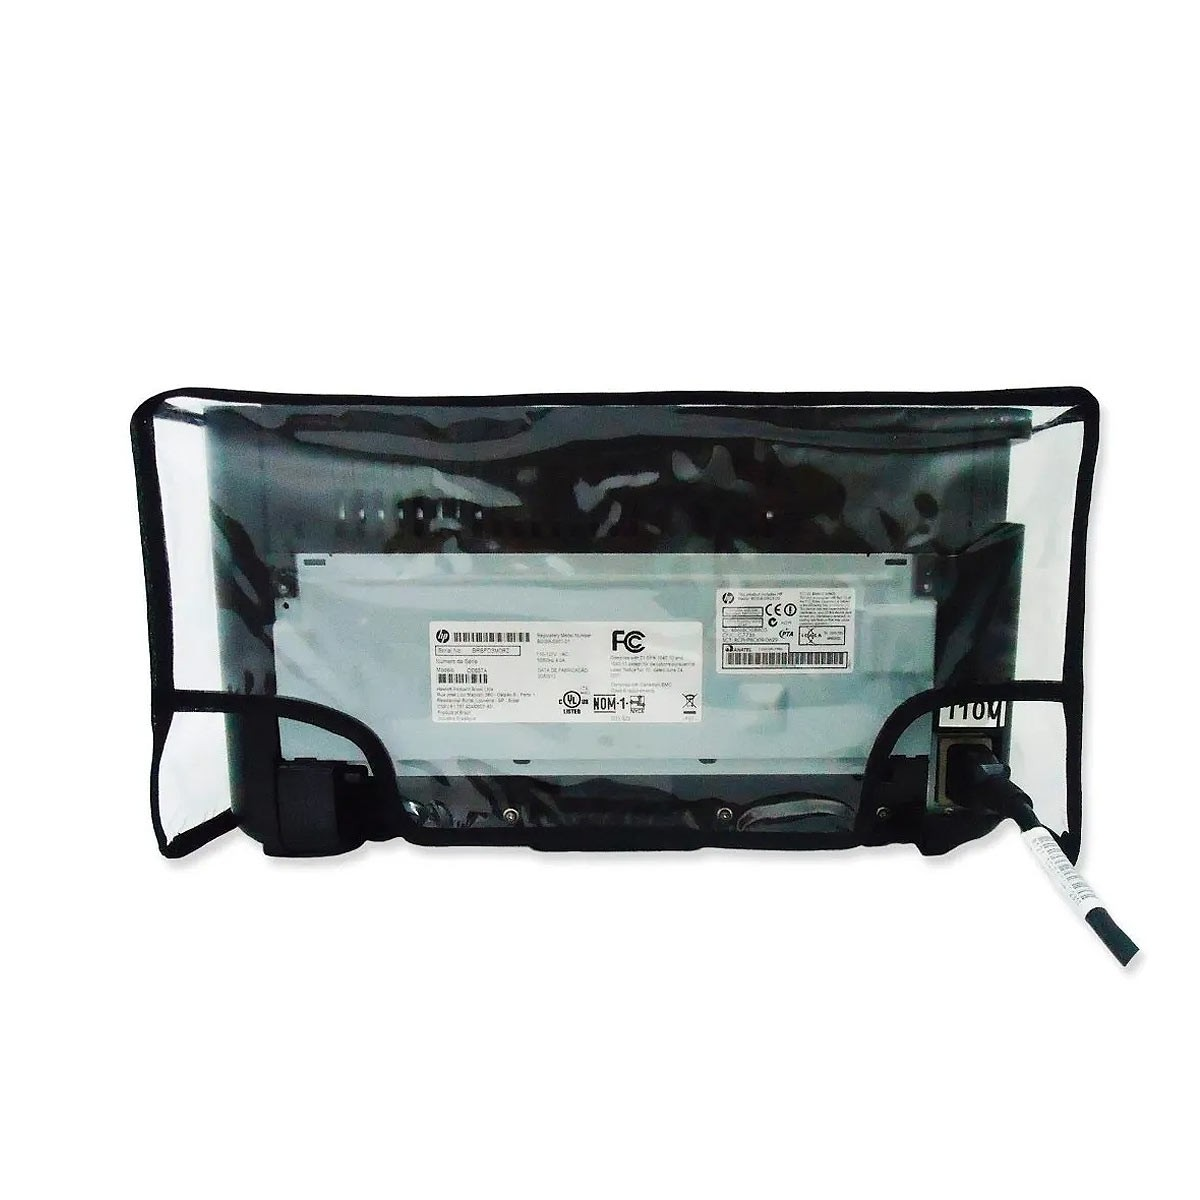 Capa Para Impressora Hp Laserjet P1102 Em Pvc Cristal